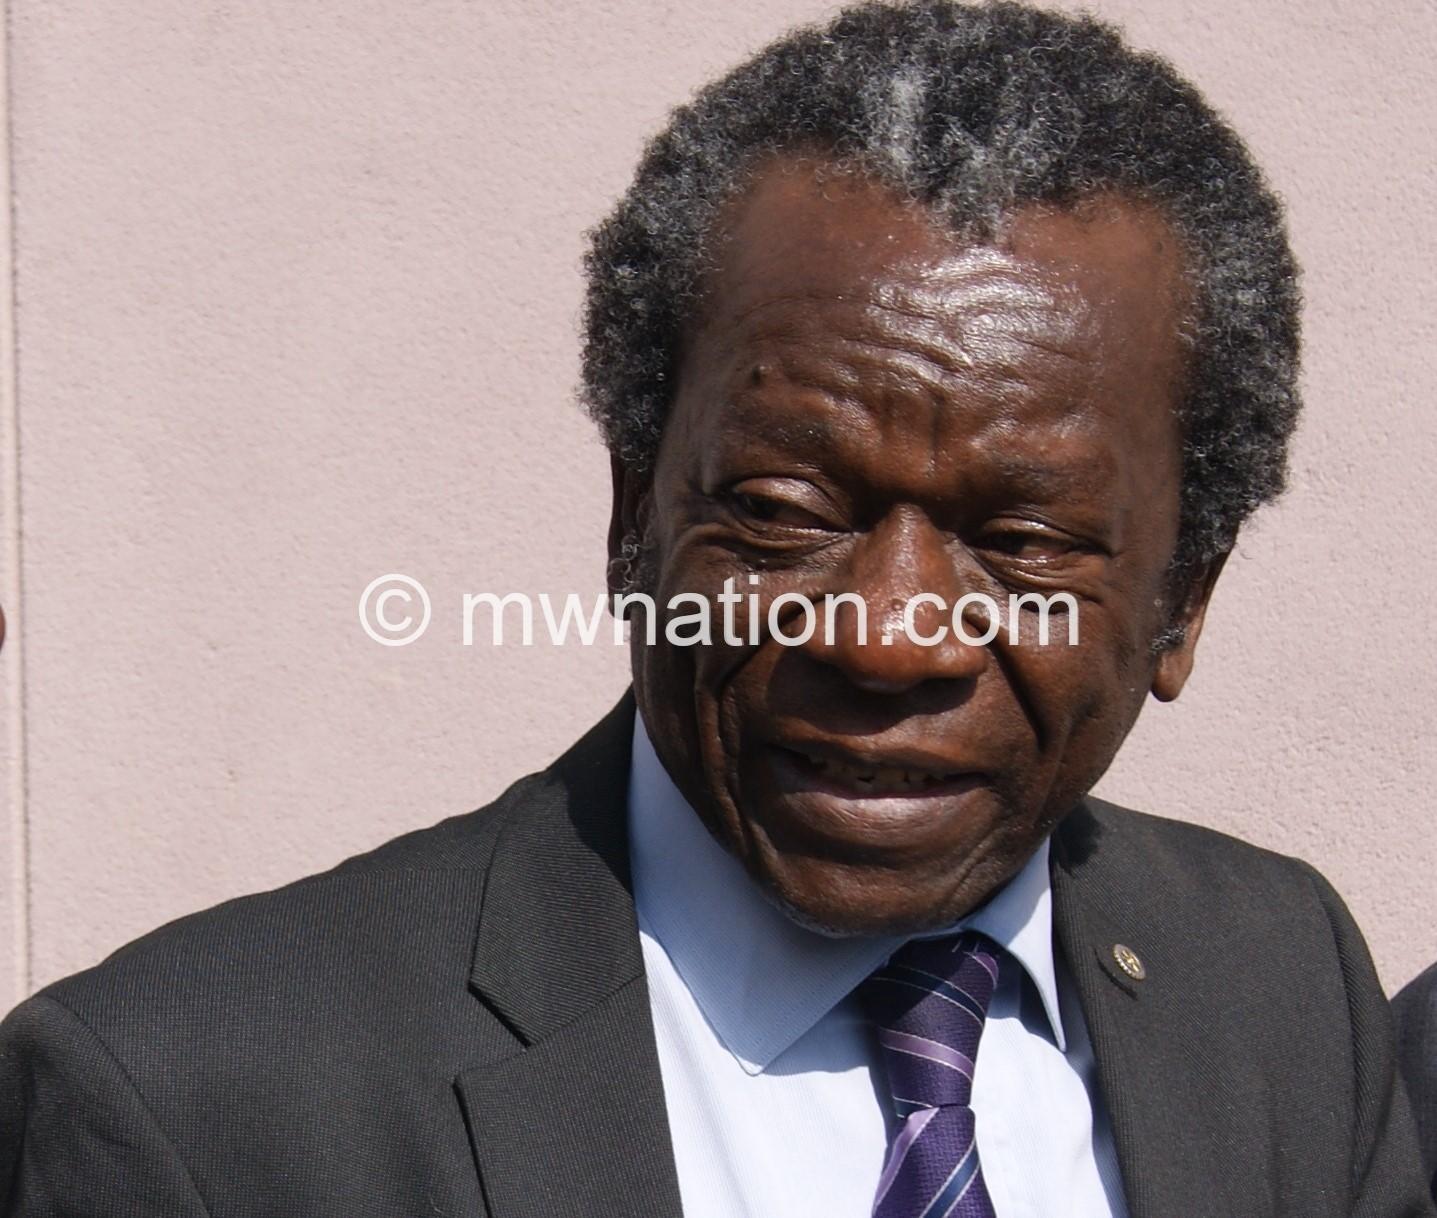 Modecai Msisha | The Nation Online